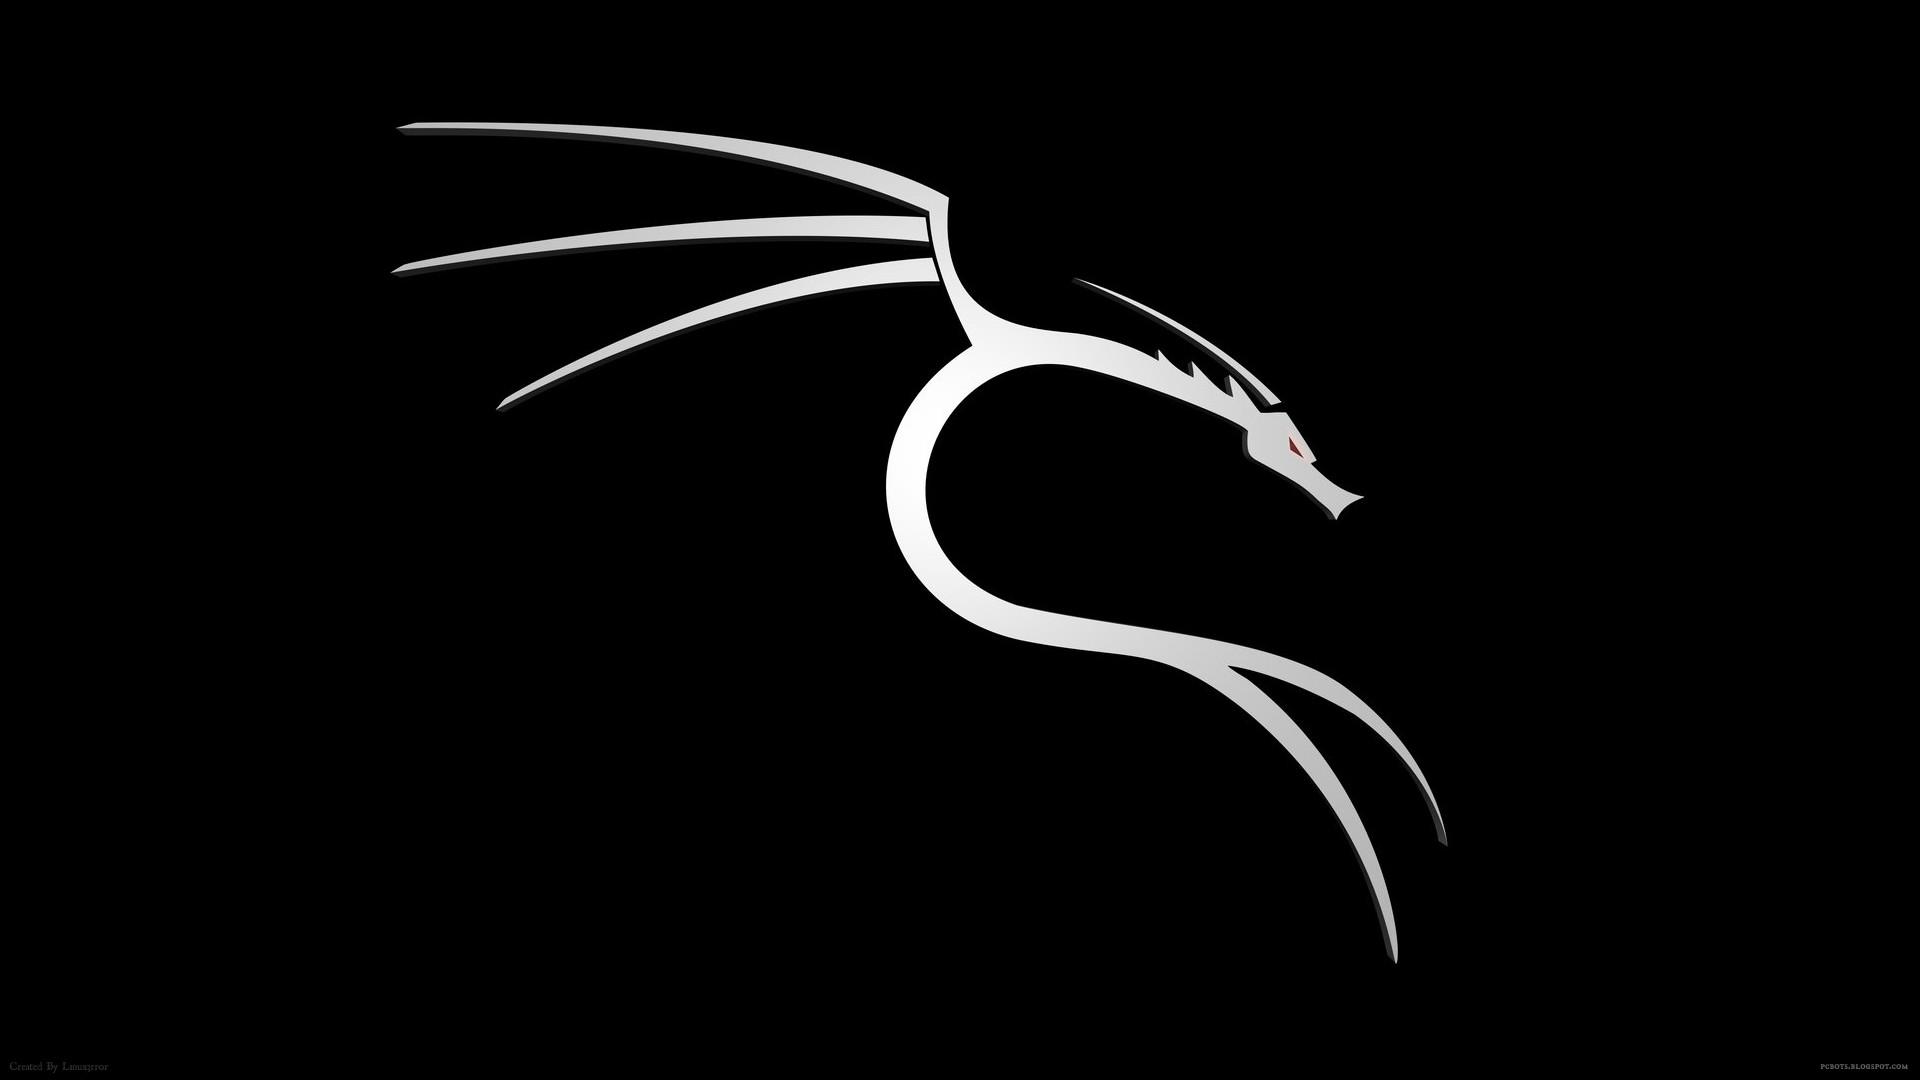 Res: 1920x1080, BackTrack Silver Dragon